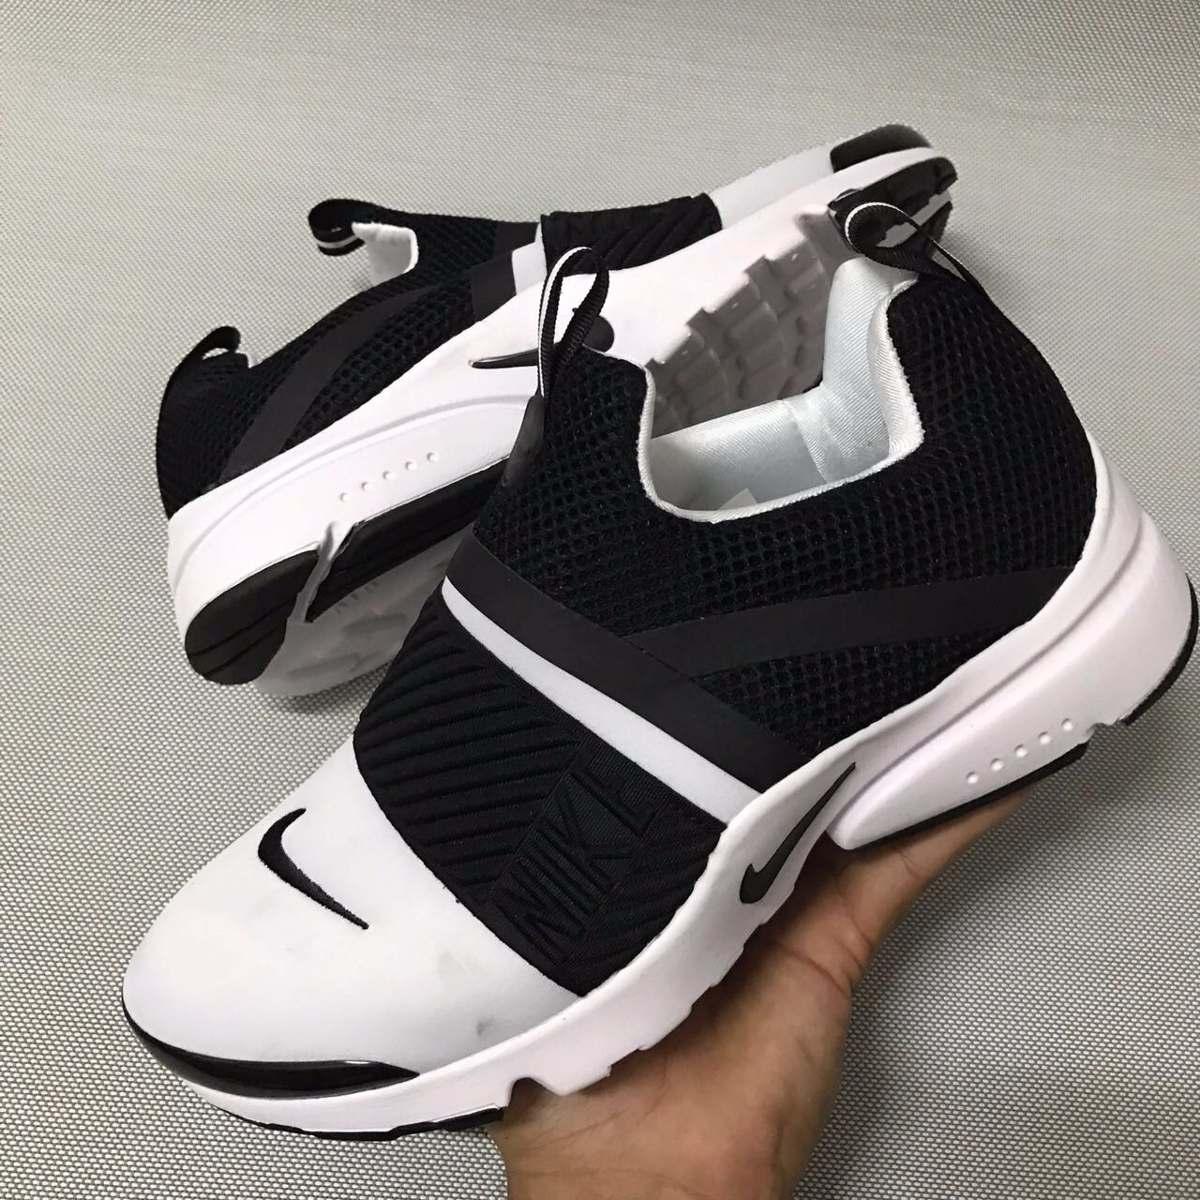 61617c9e101b1 Tenis Zapatillas Nike Hombre Ultima Coleccion -   245.000 en Mercado ...